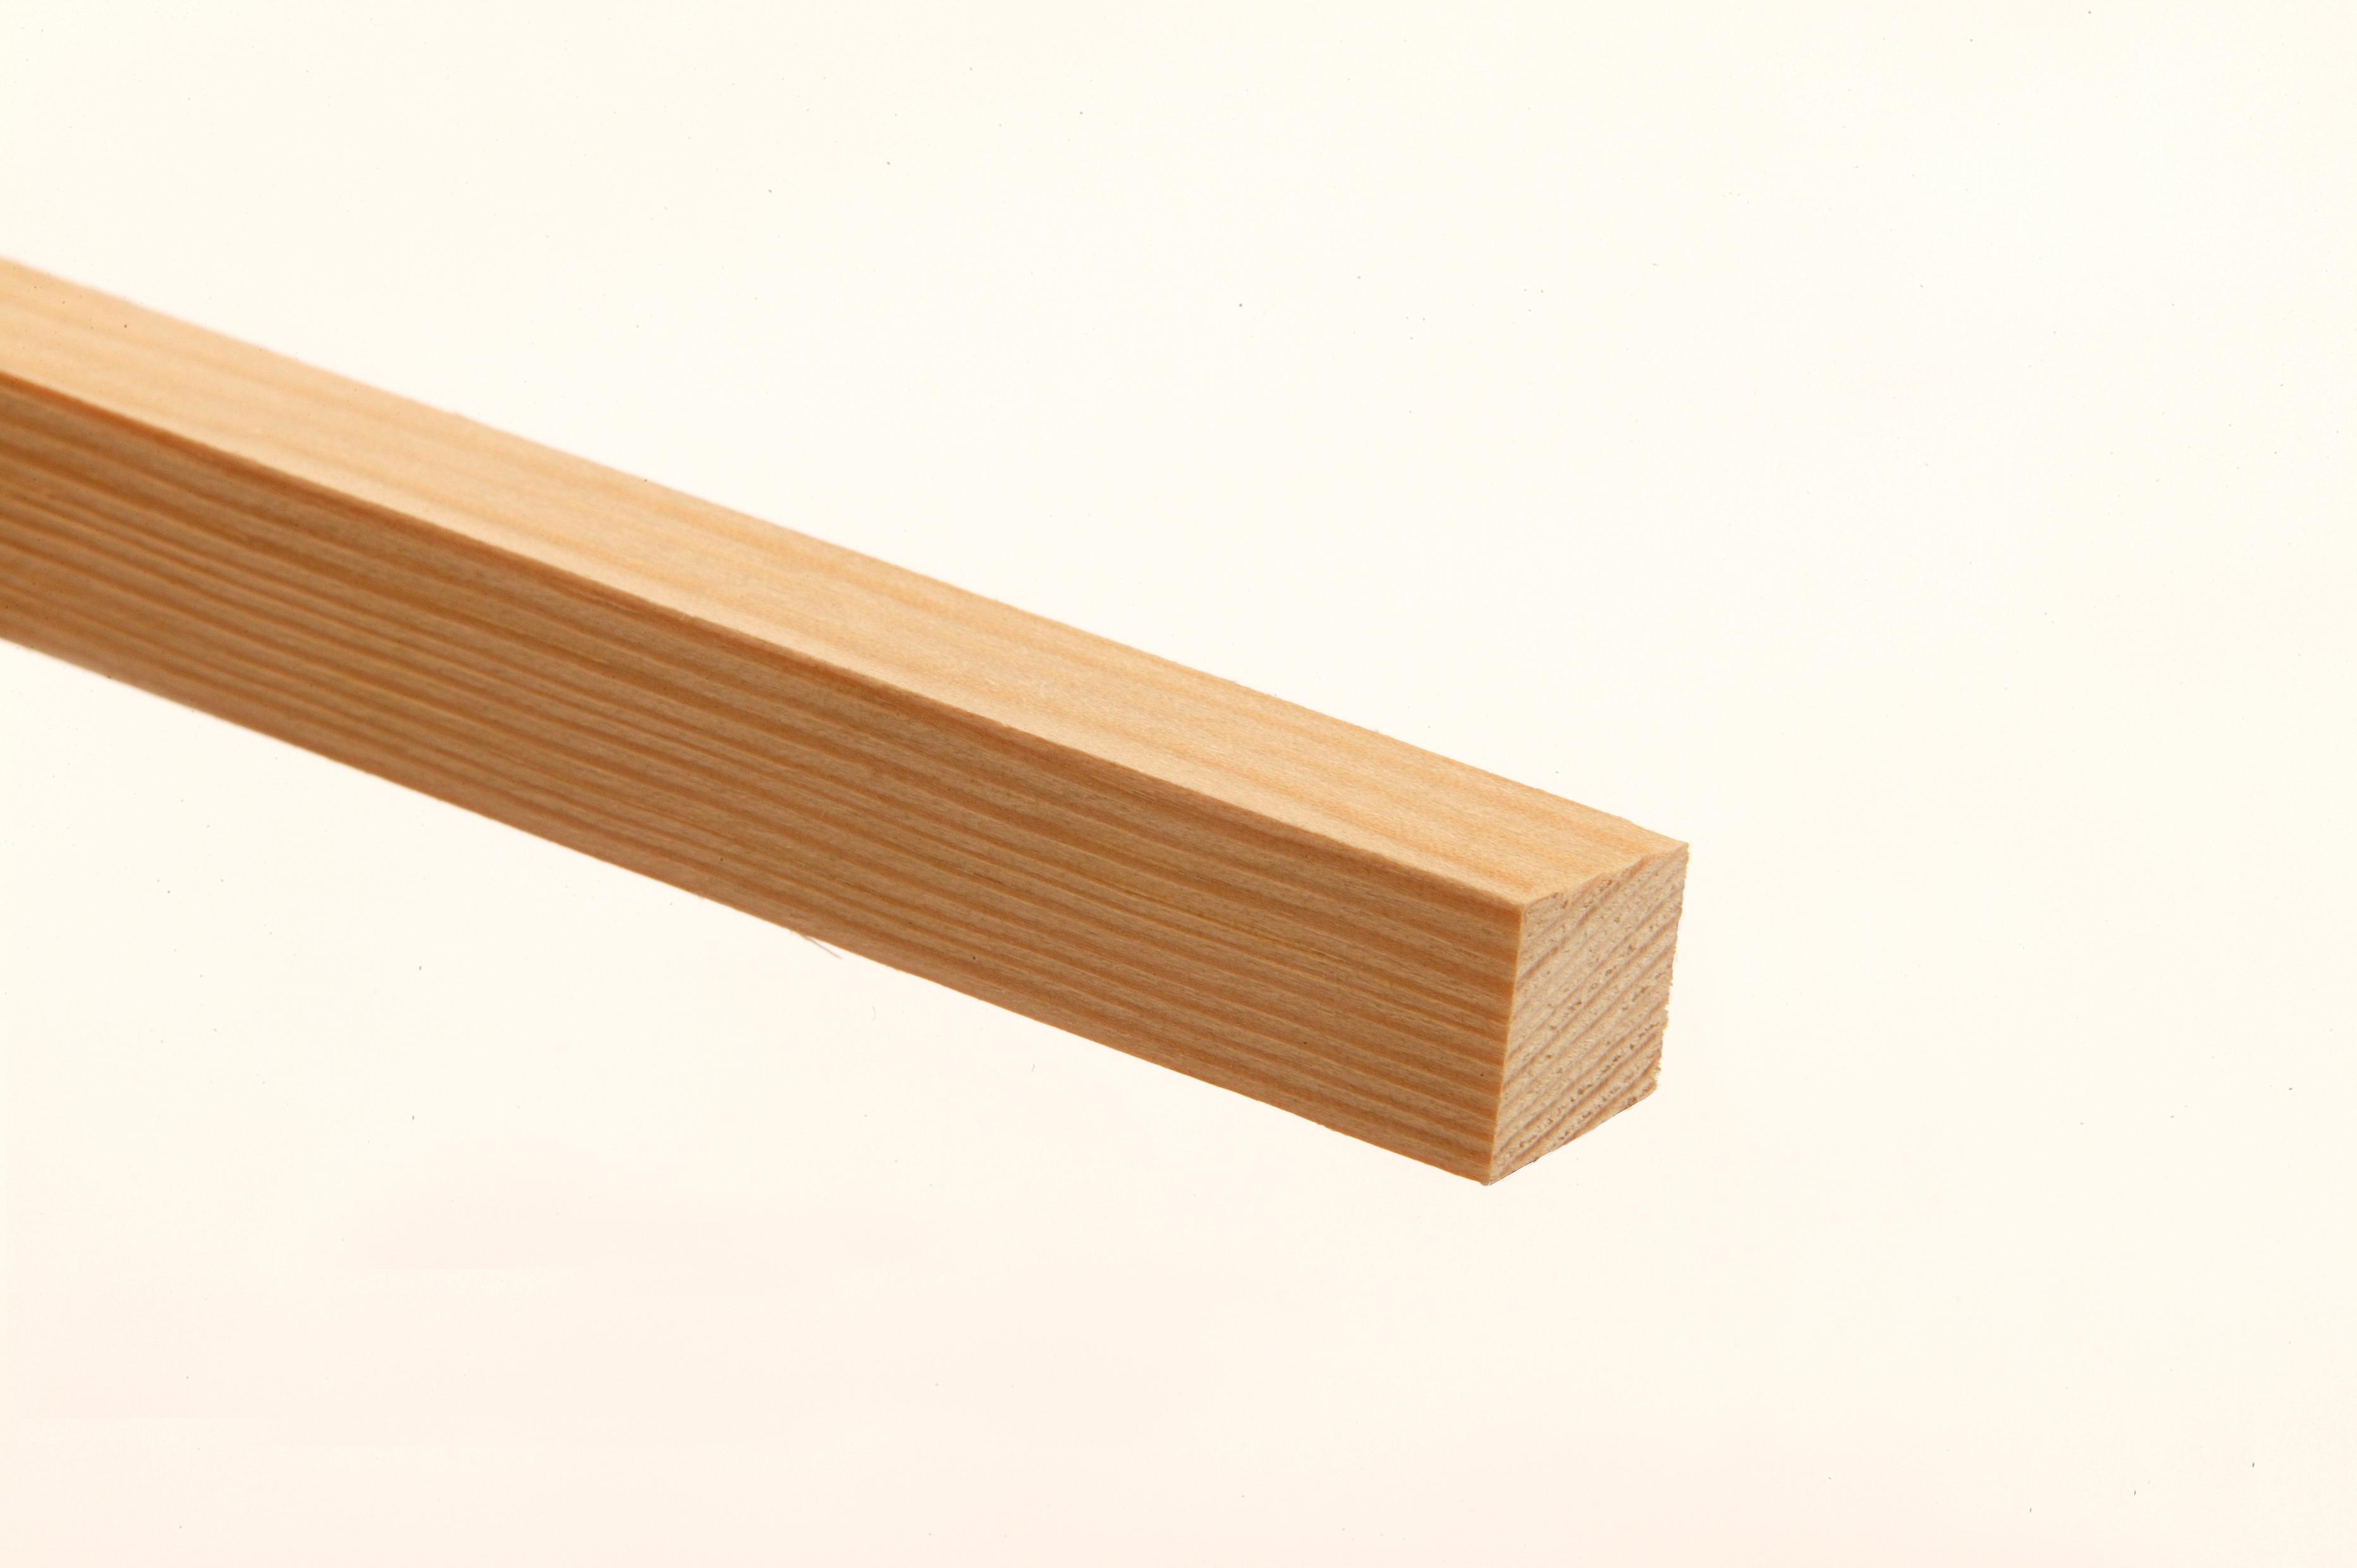 20 Pine PSE Stripwood 25 x 25 x 2400mm